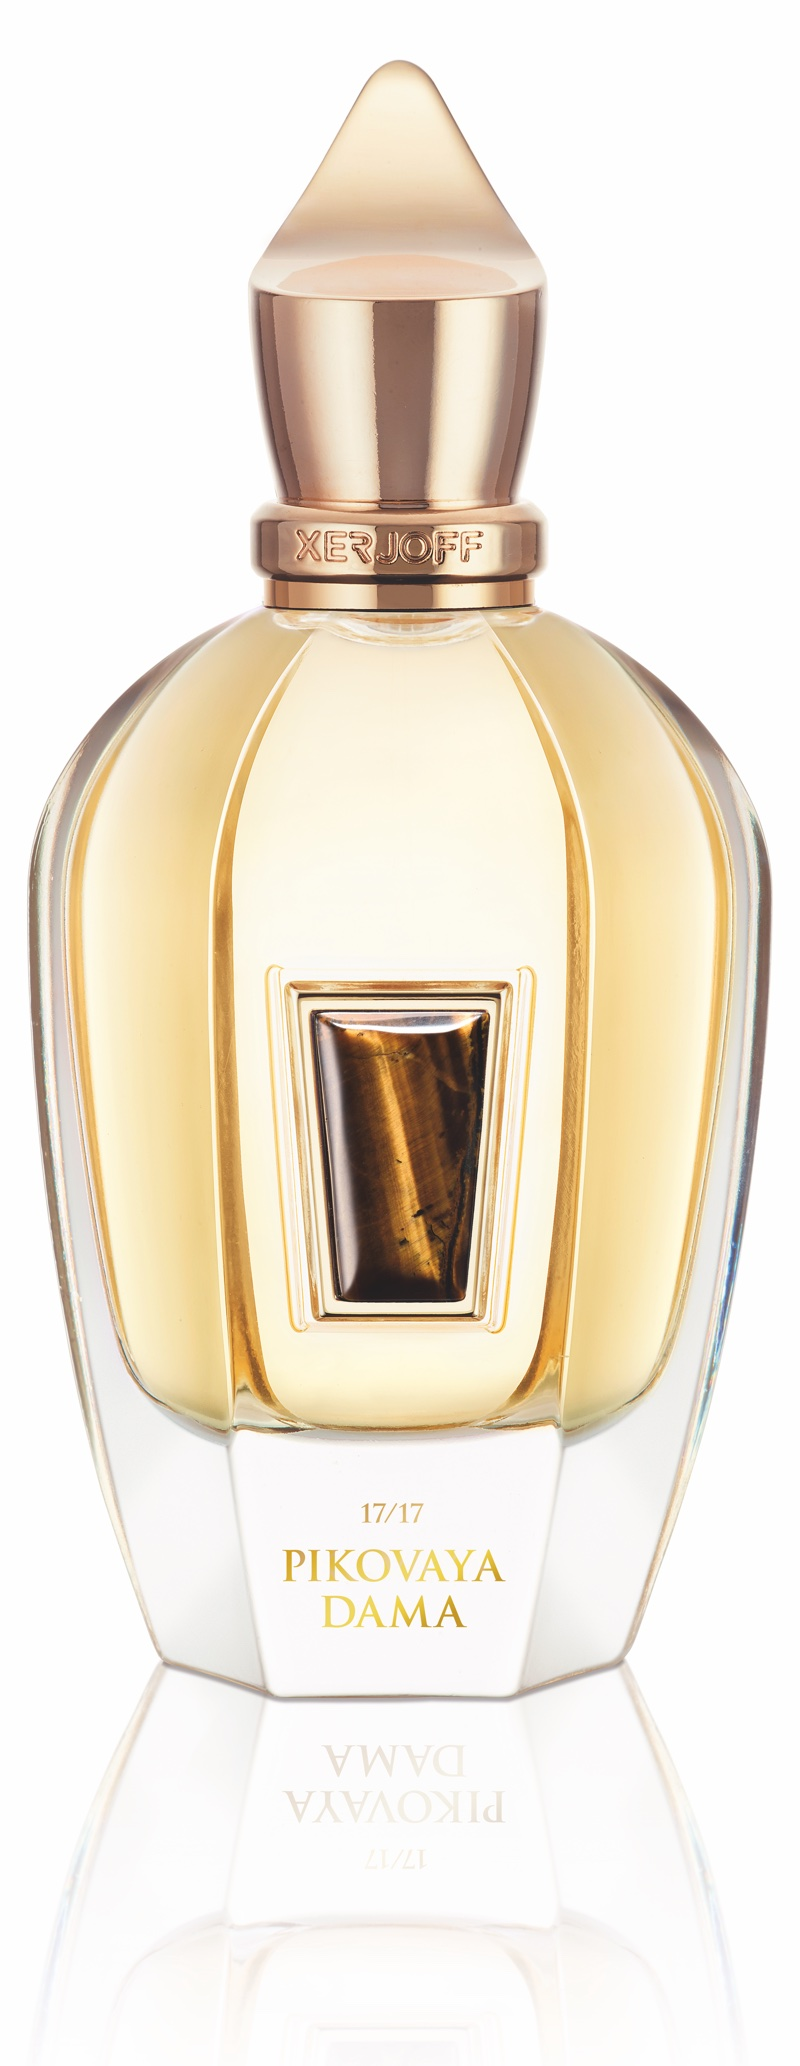 Luxury Italian fragrance brand Xerjoff celebrates Russian